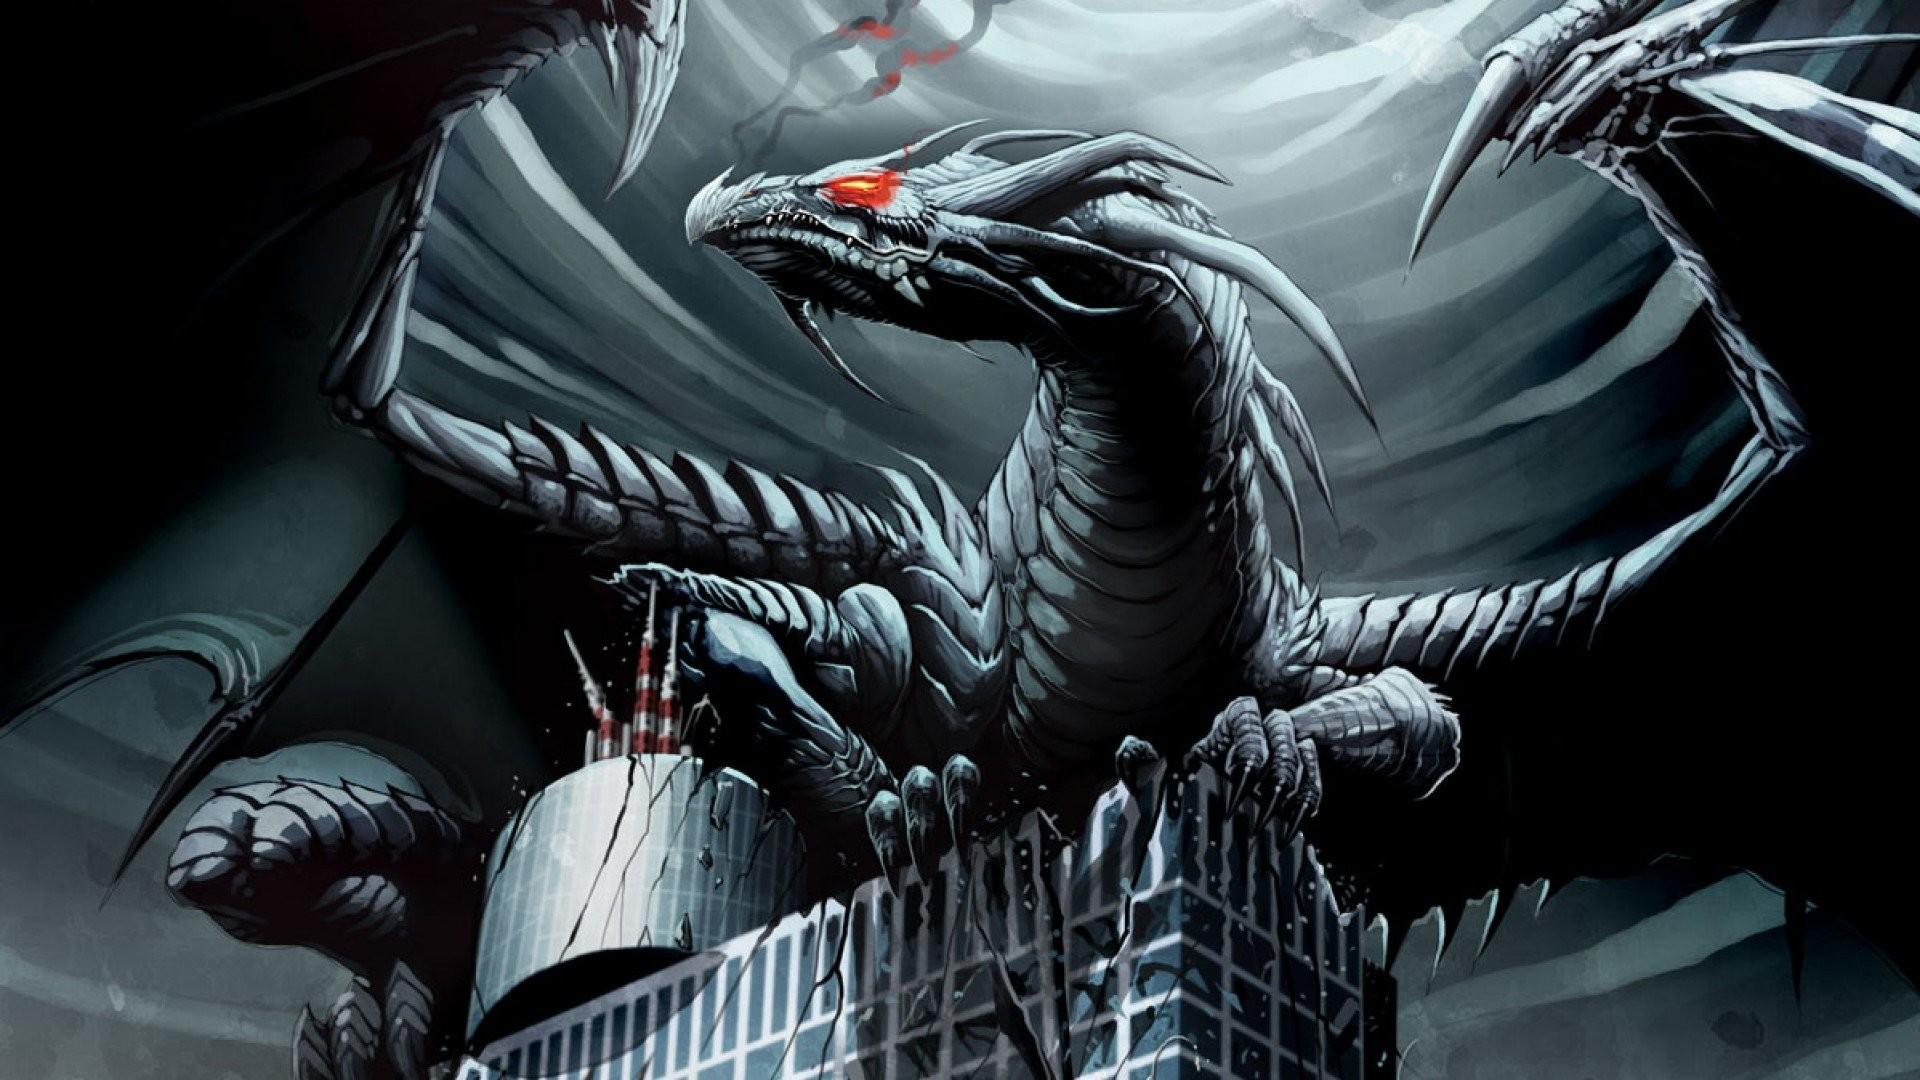 Black dragon wallpaper widescreen desktop mobile iphone android hd wallpaper  and desktop.